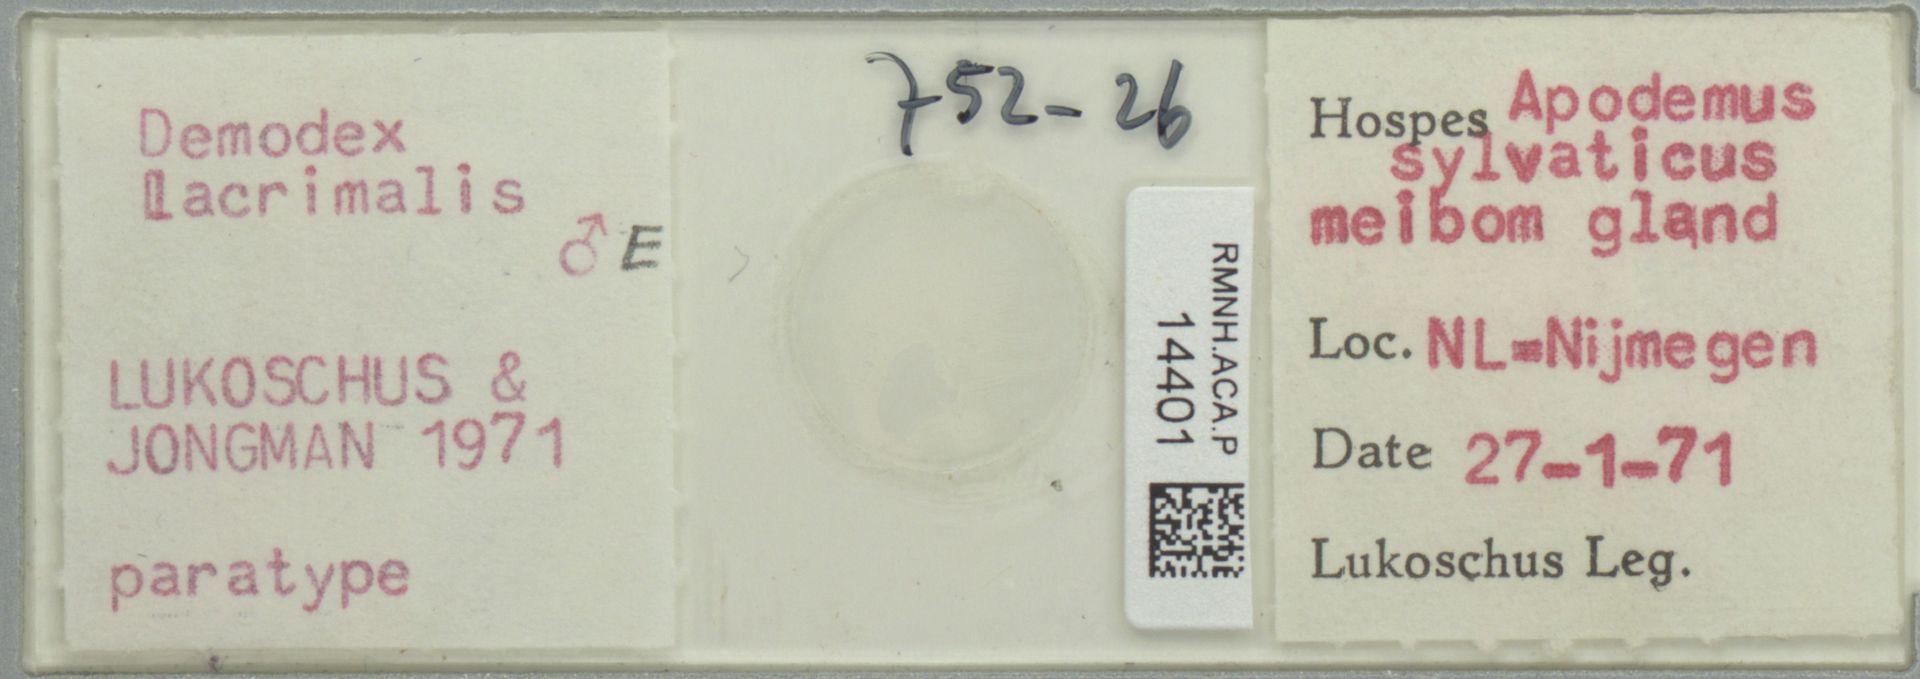 RMNH.ACA.P.14401 | Demodex lacrimalis Lukoschus & Jongman, 1971